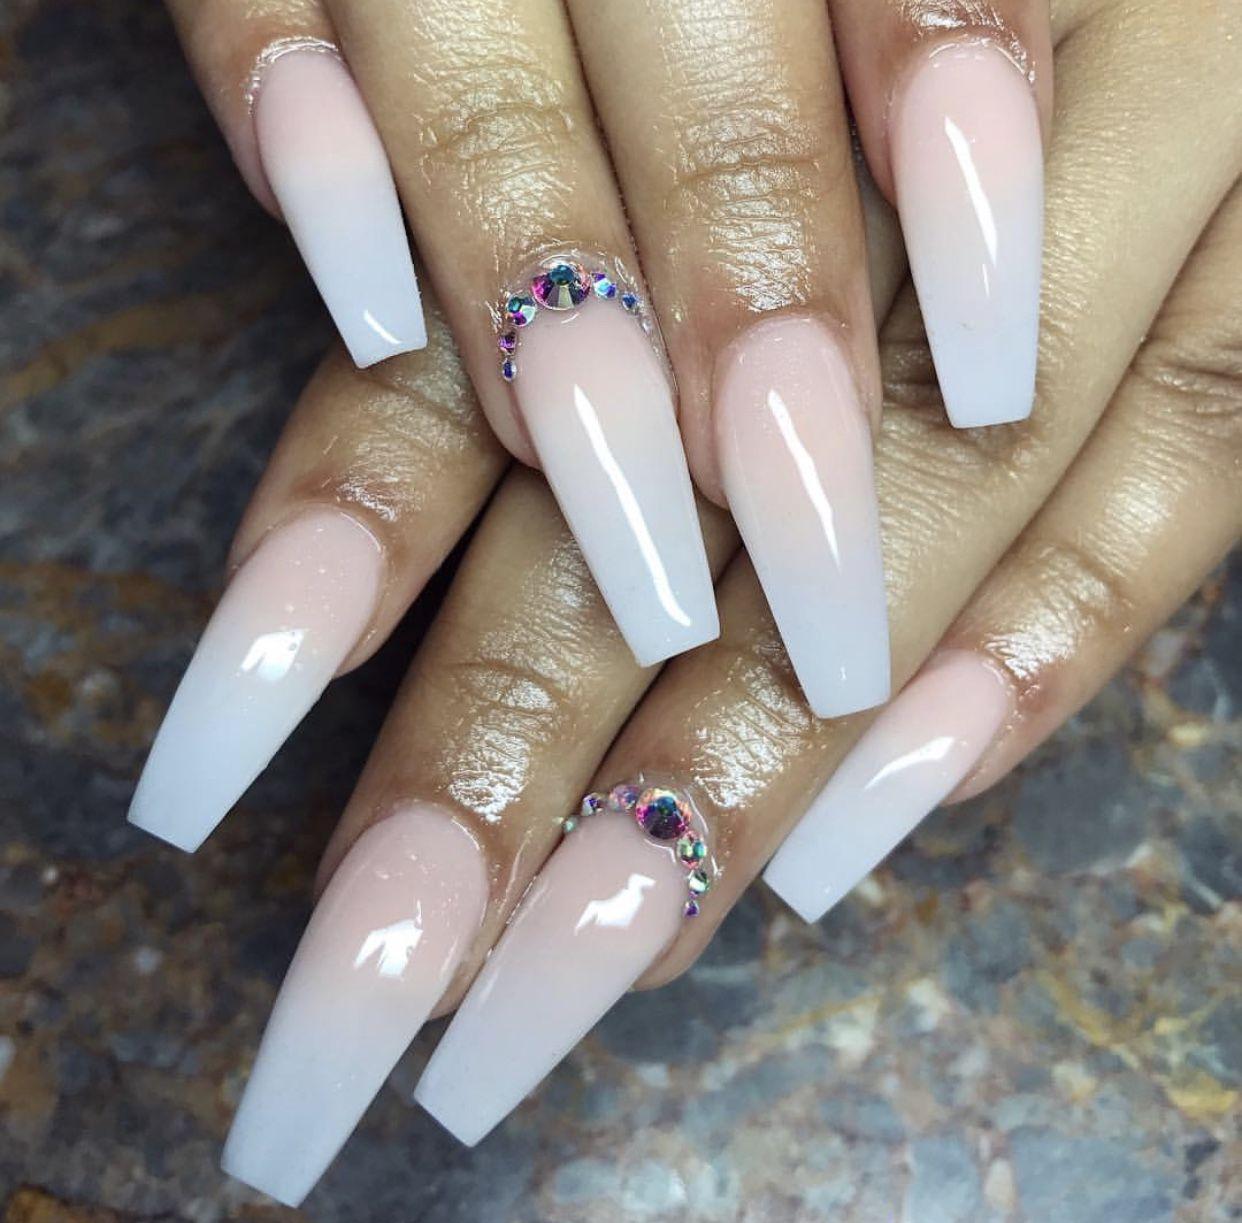 Pinterest @anyra_h❣ | C L A W S ✨ | Pinterest | Natural nails ...